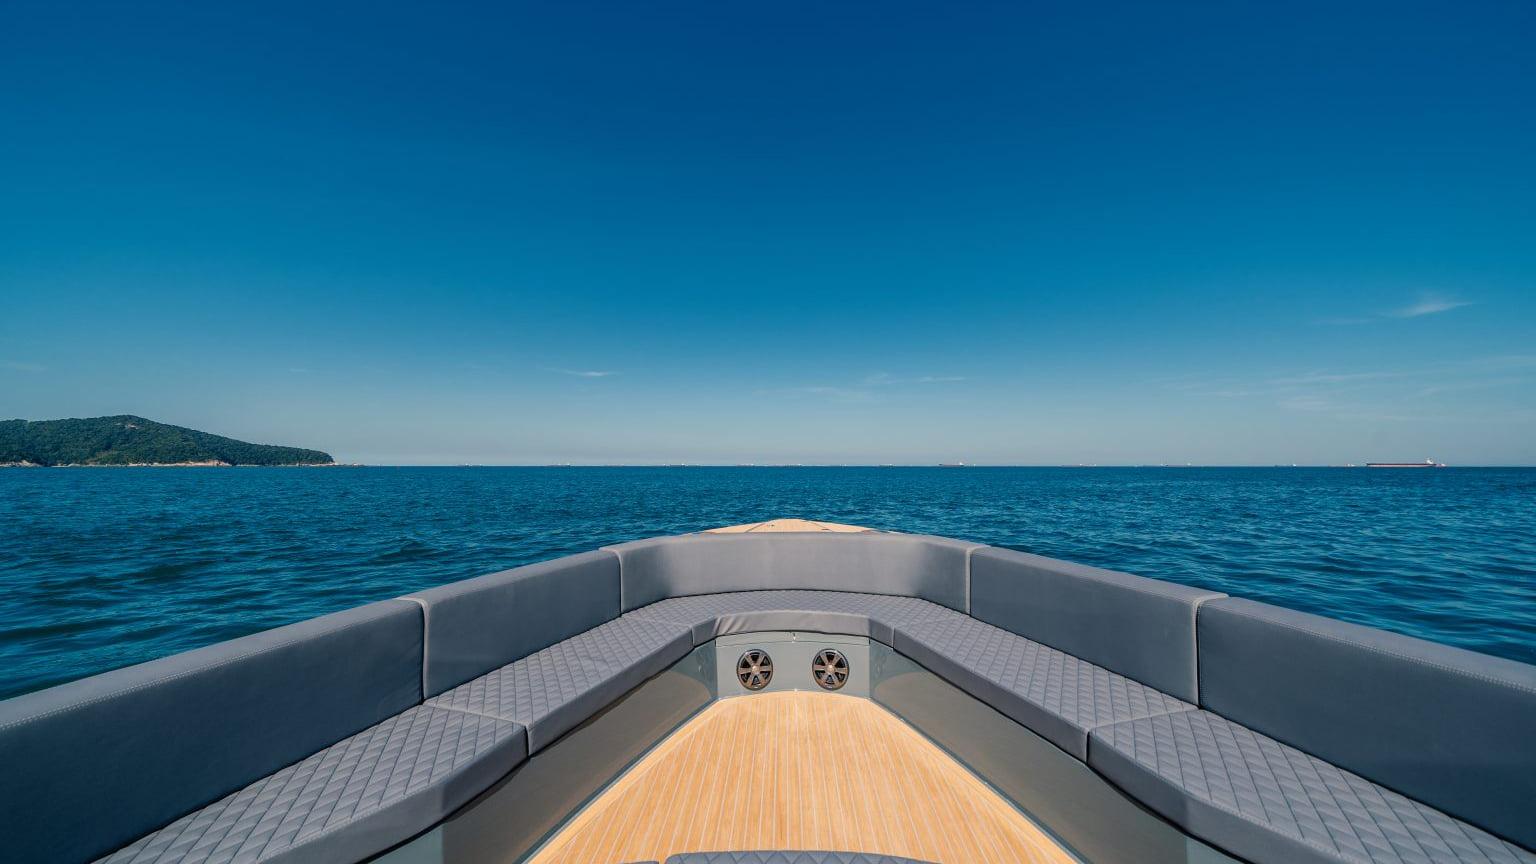 Okean 55 sport-ht - exteriores (22)